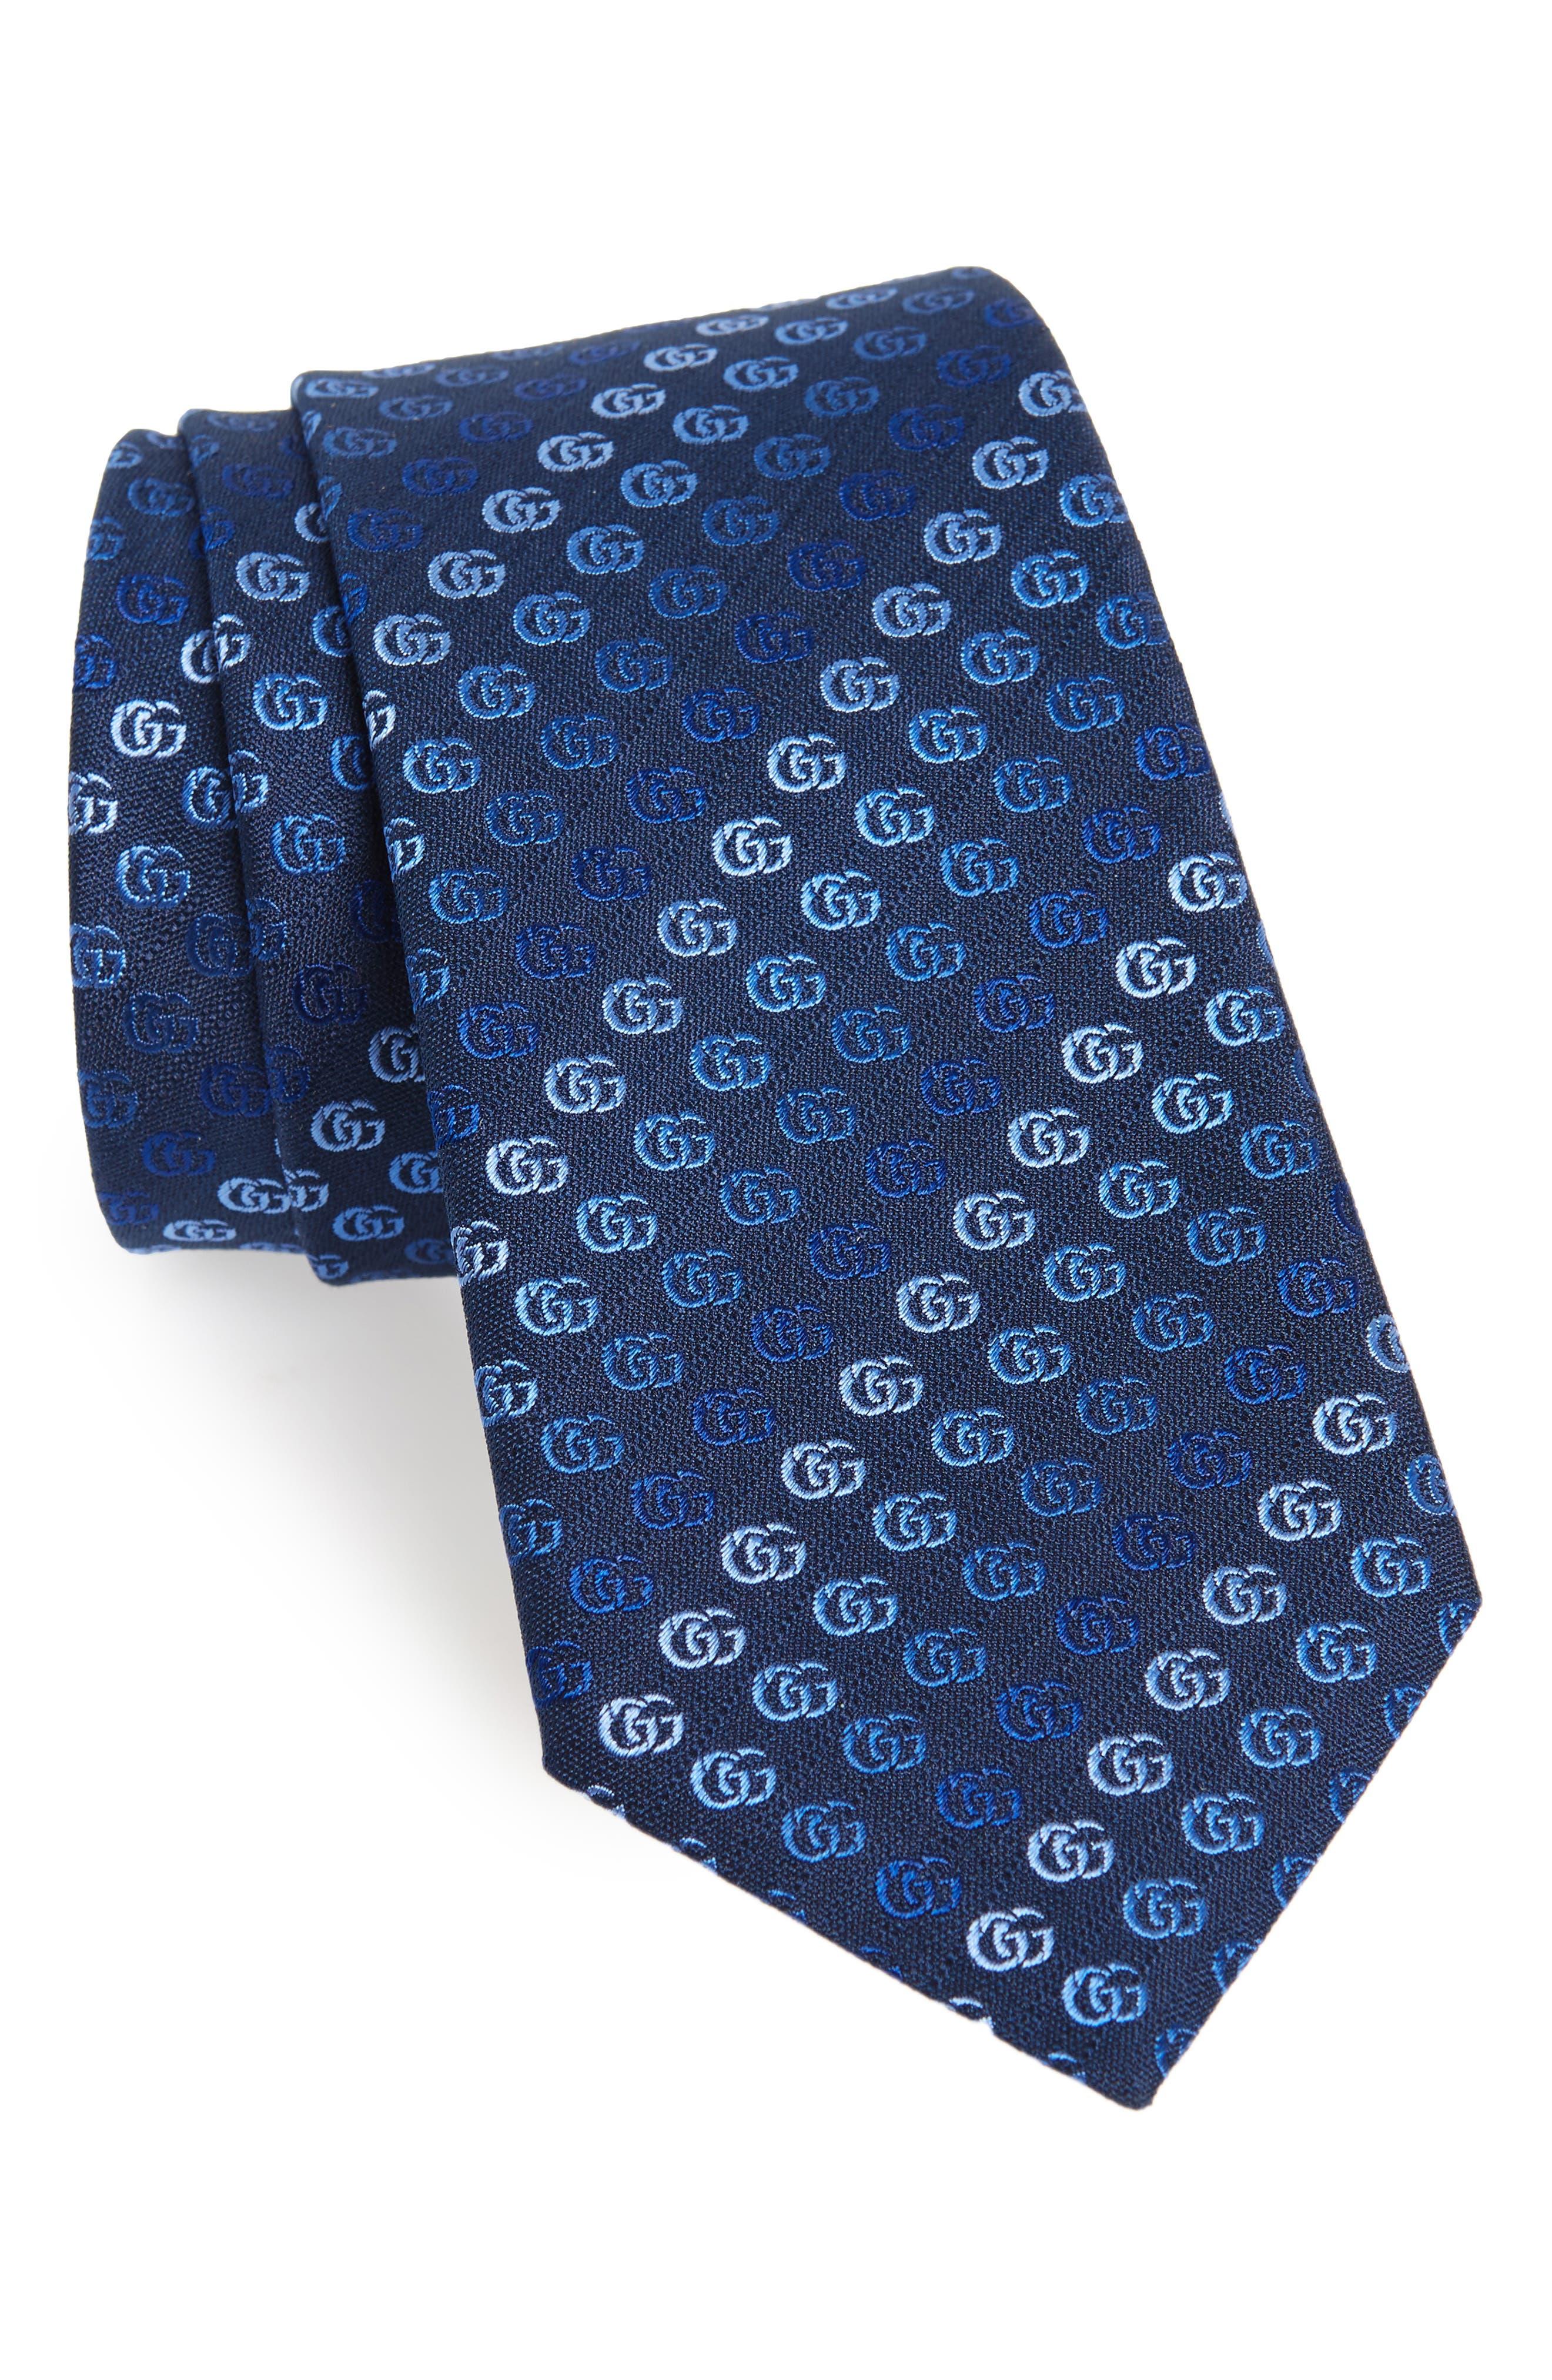 Main Image - Gucci Soft Running GG Silk Tie